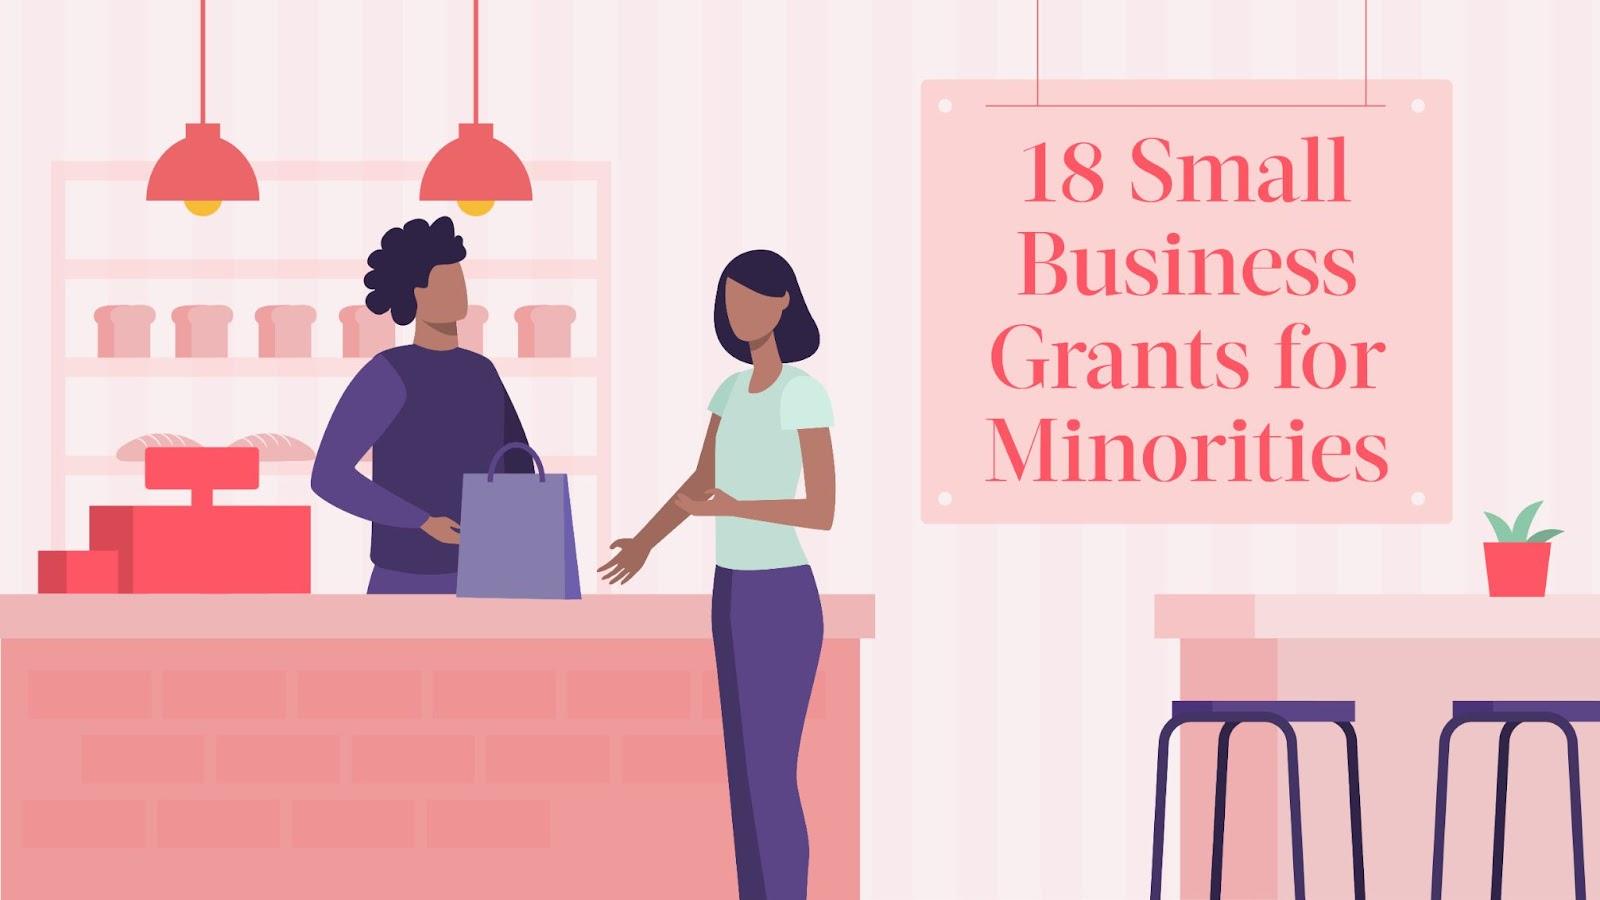 18 Small Business Grants for Minorities